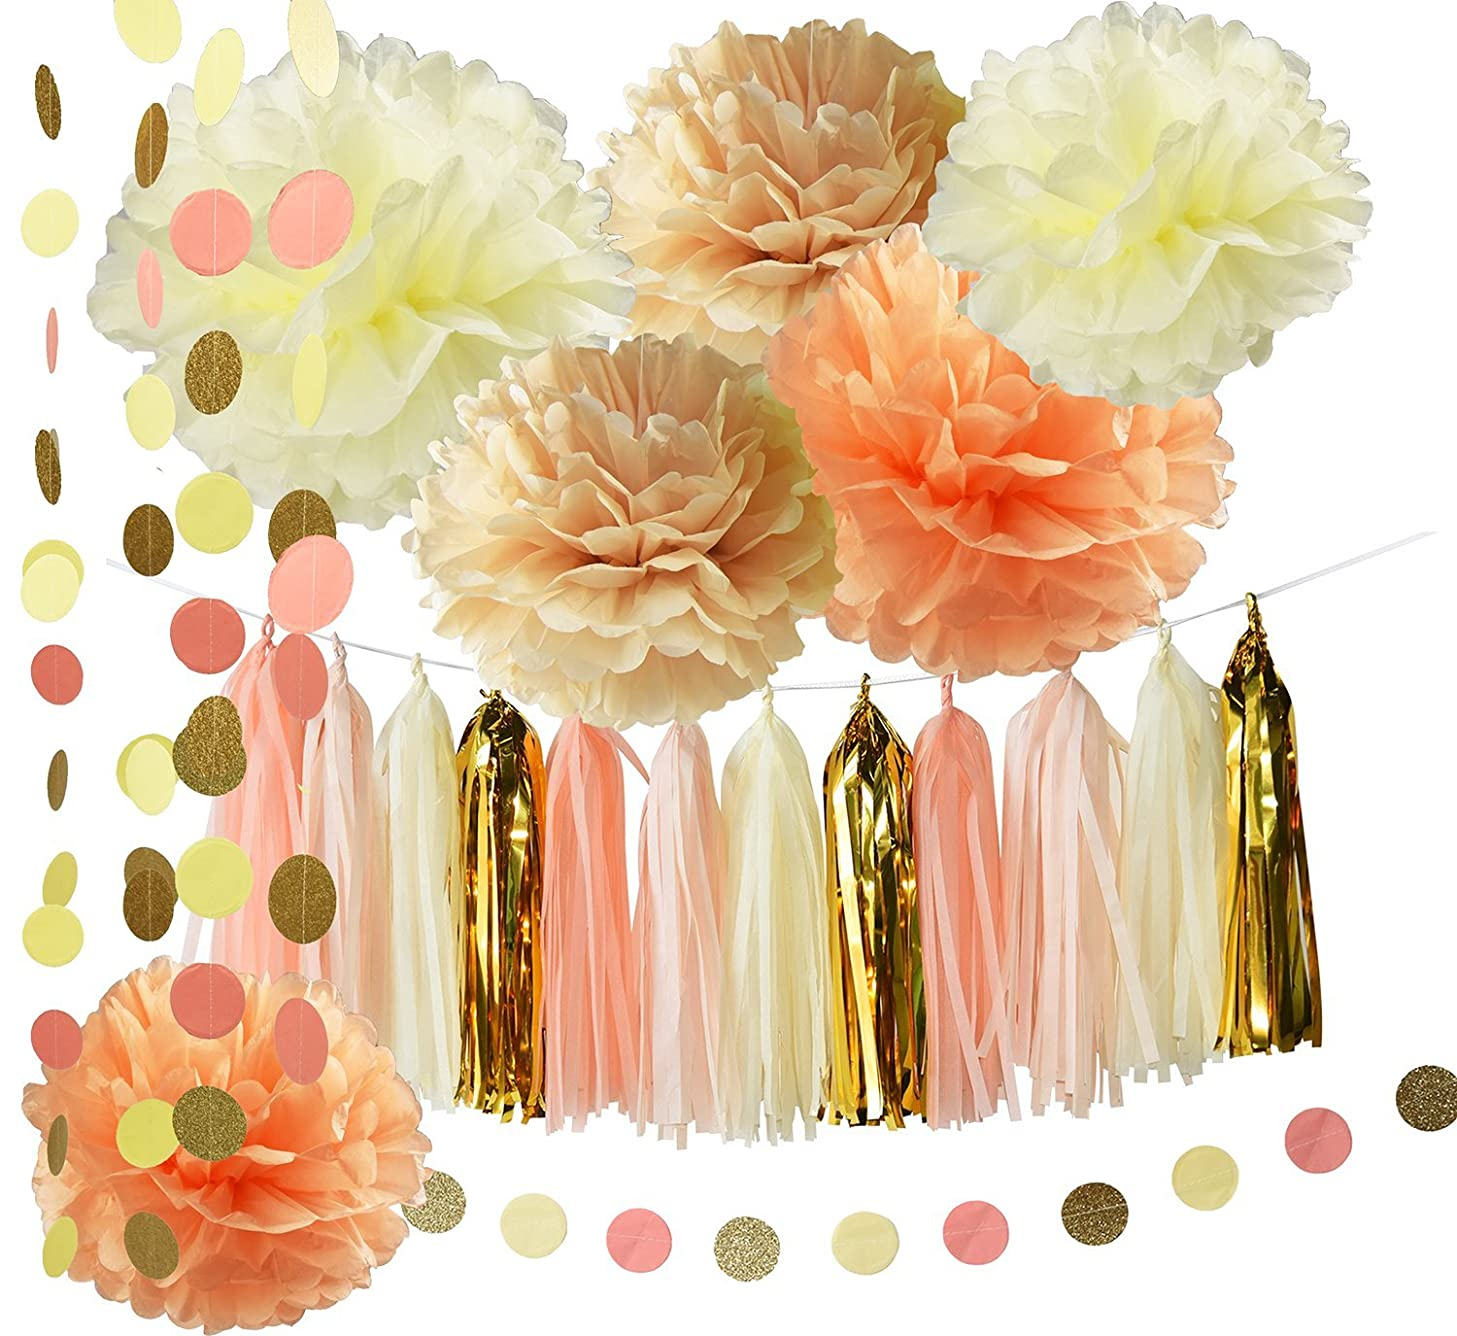 Rustic/Vintage Baby Shower Decorations Birthday Decor Tassel Garland in Cream Peach Champagne Tissue Paper Pom Pom Circle Paper Garland Girl Bridal Shower Decorations/Autumn Fall Party Decorations